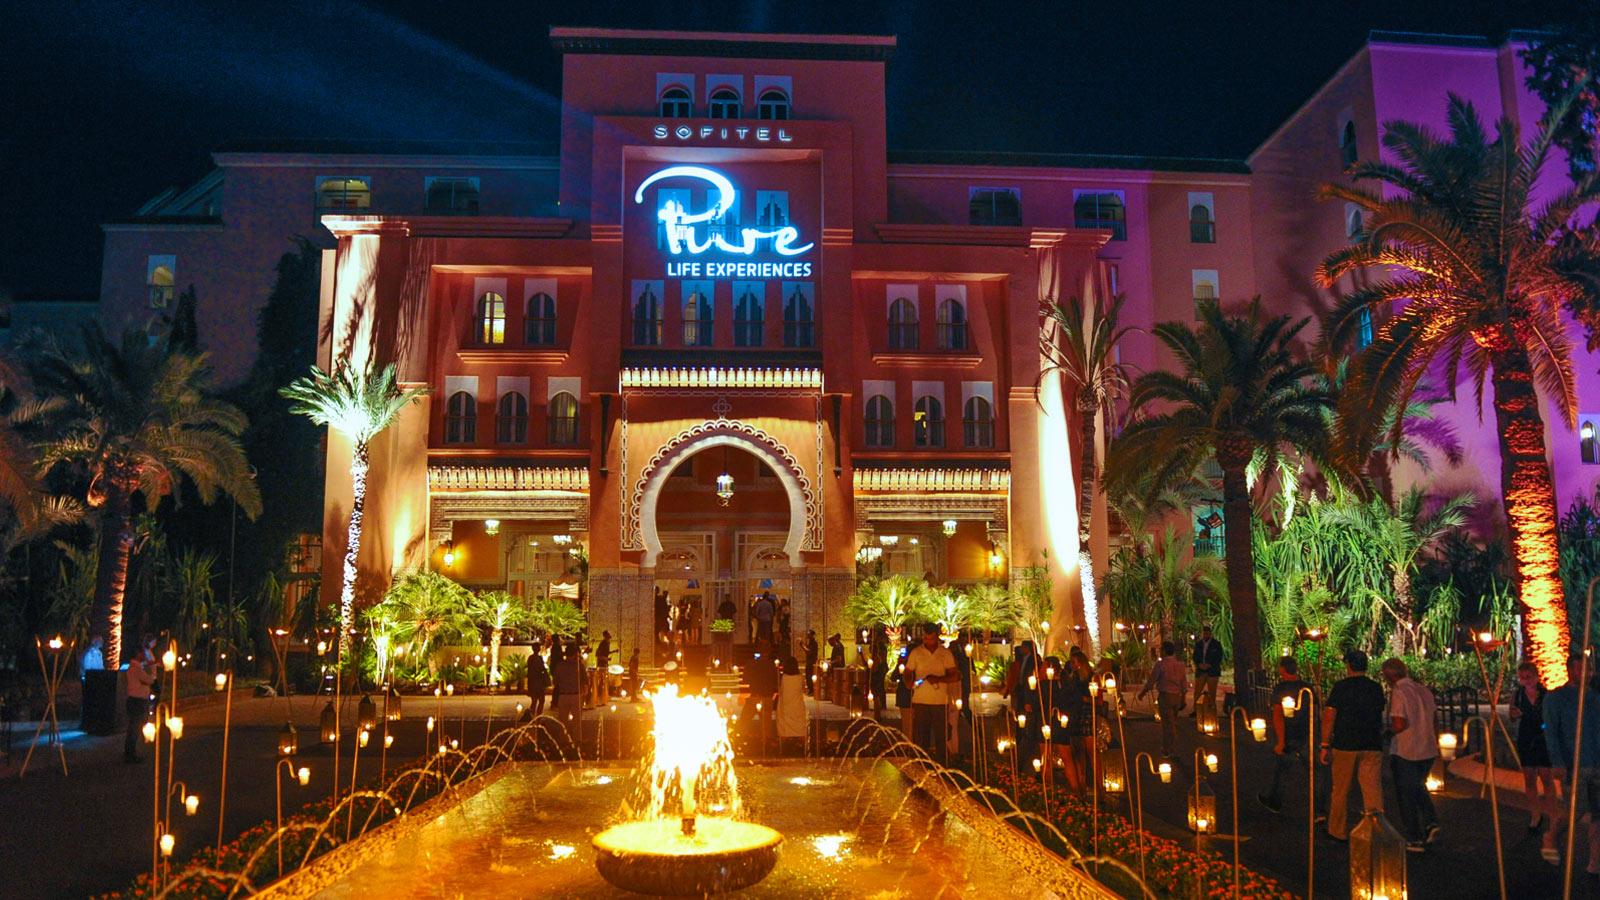 Sofitel Marrakech, Prestigious Venues, 2